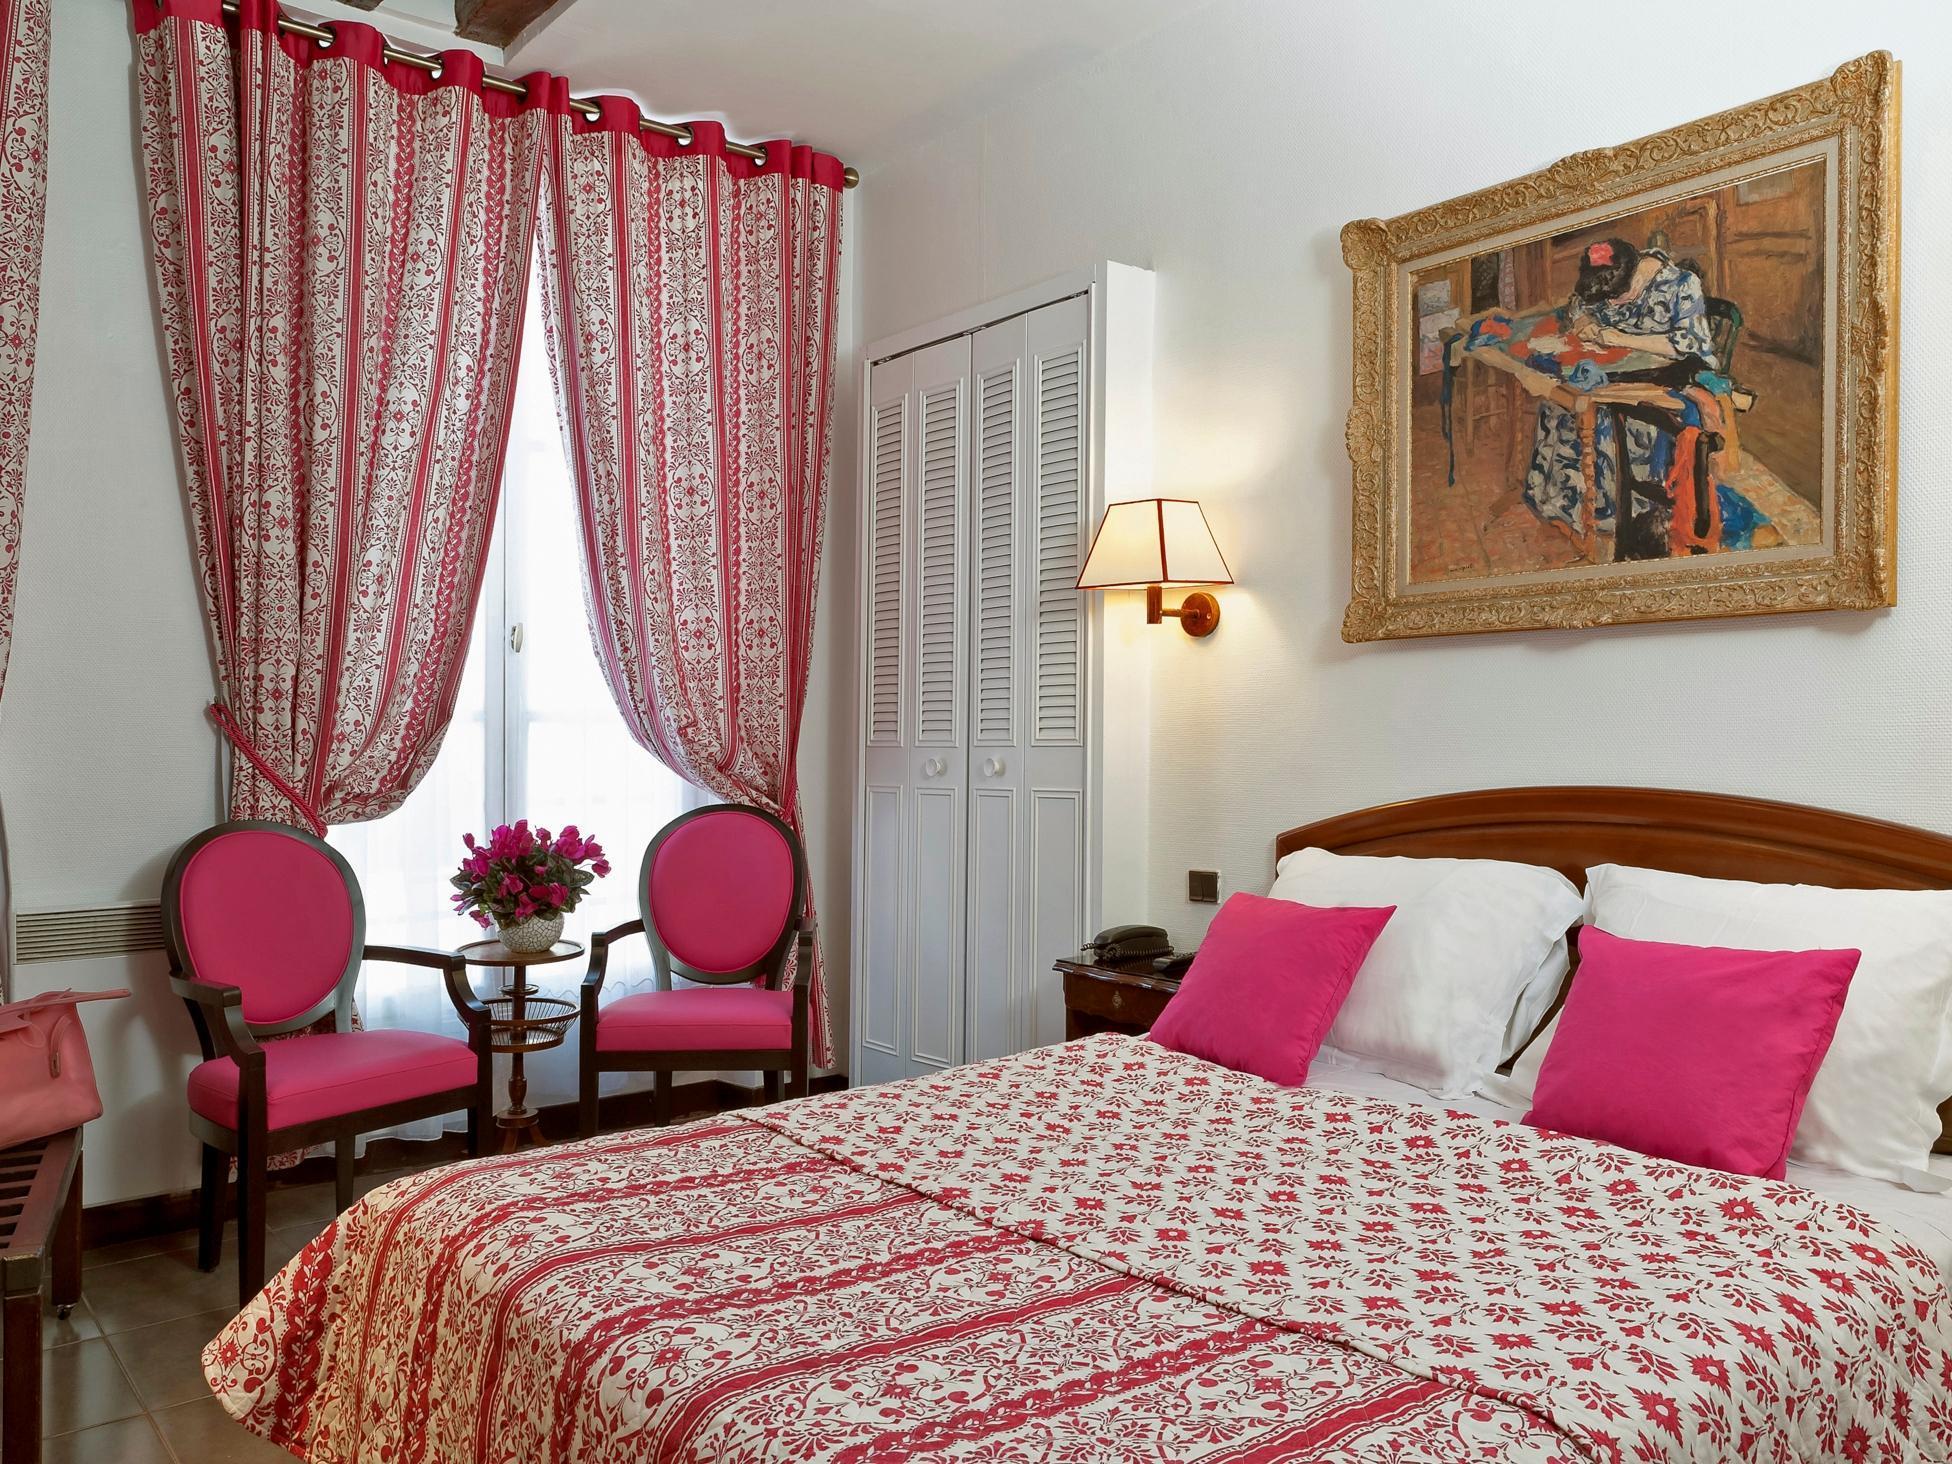 Hotel Bersolys